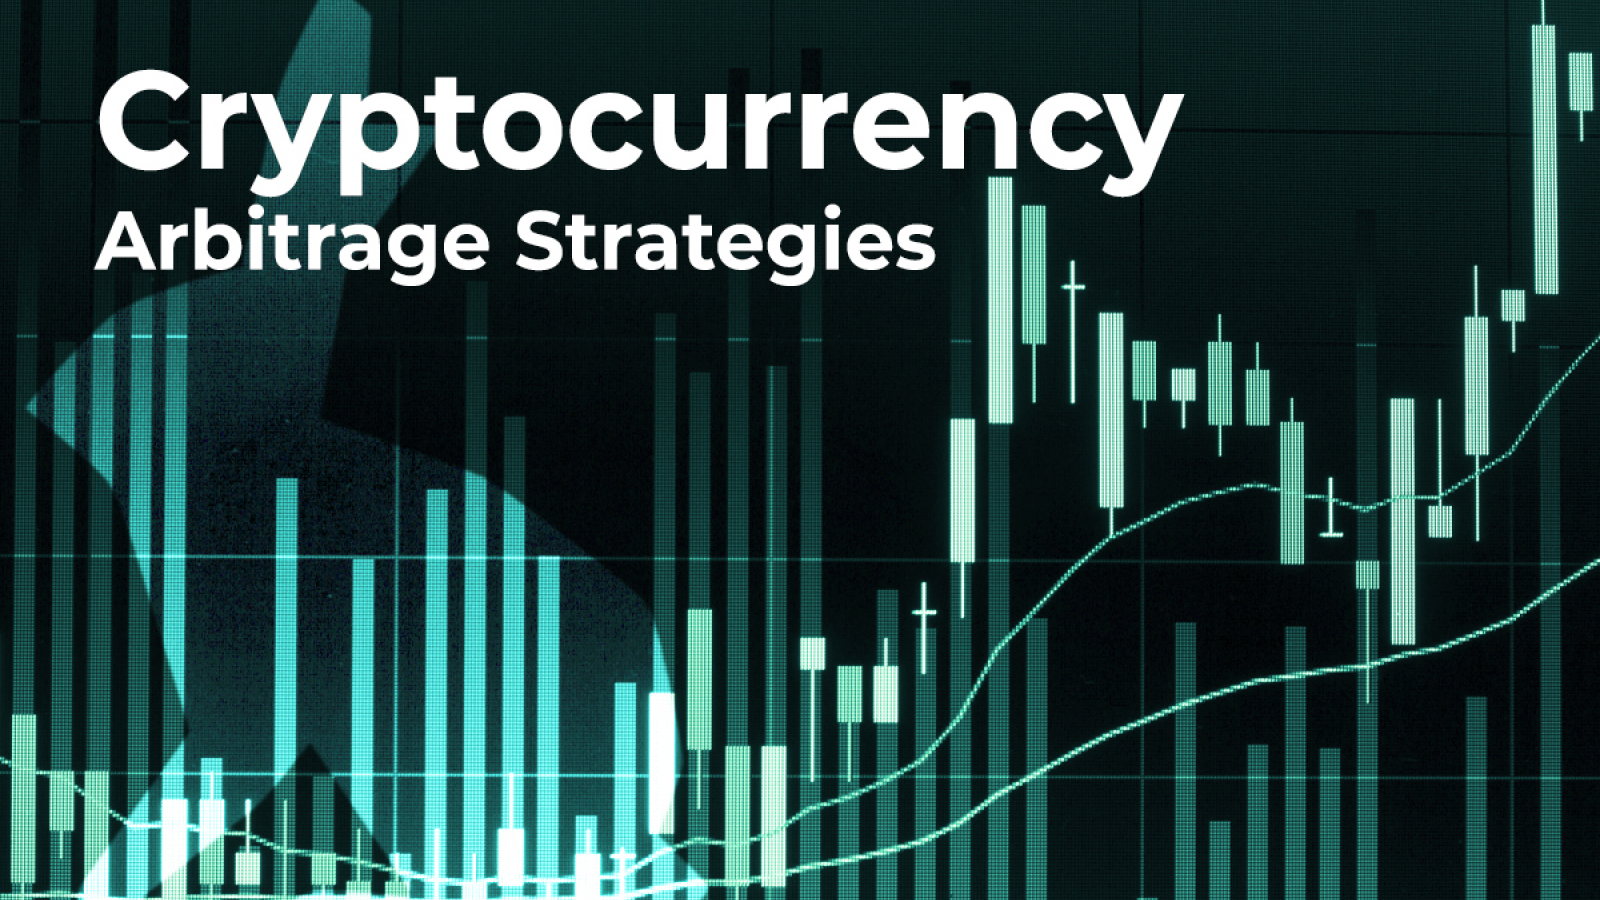 triangular trade of cryptocurrencies